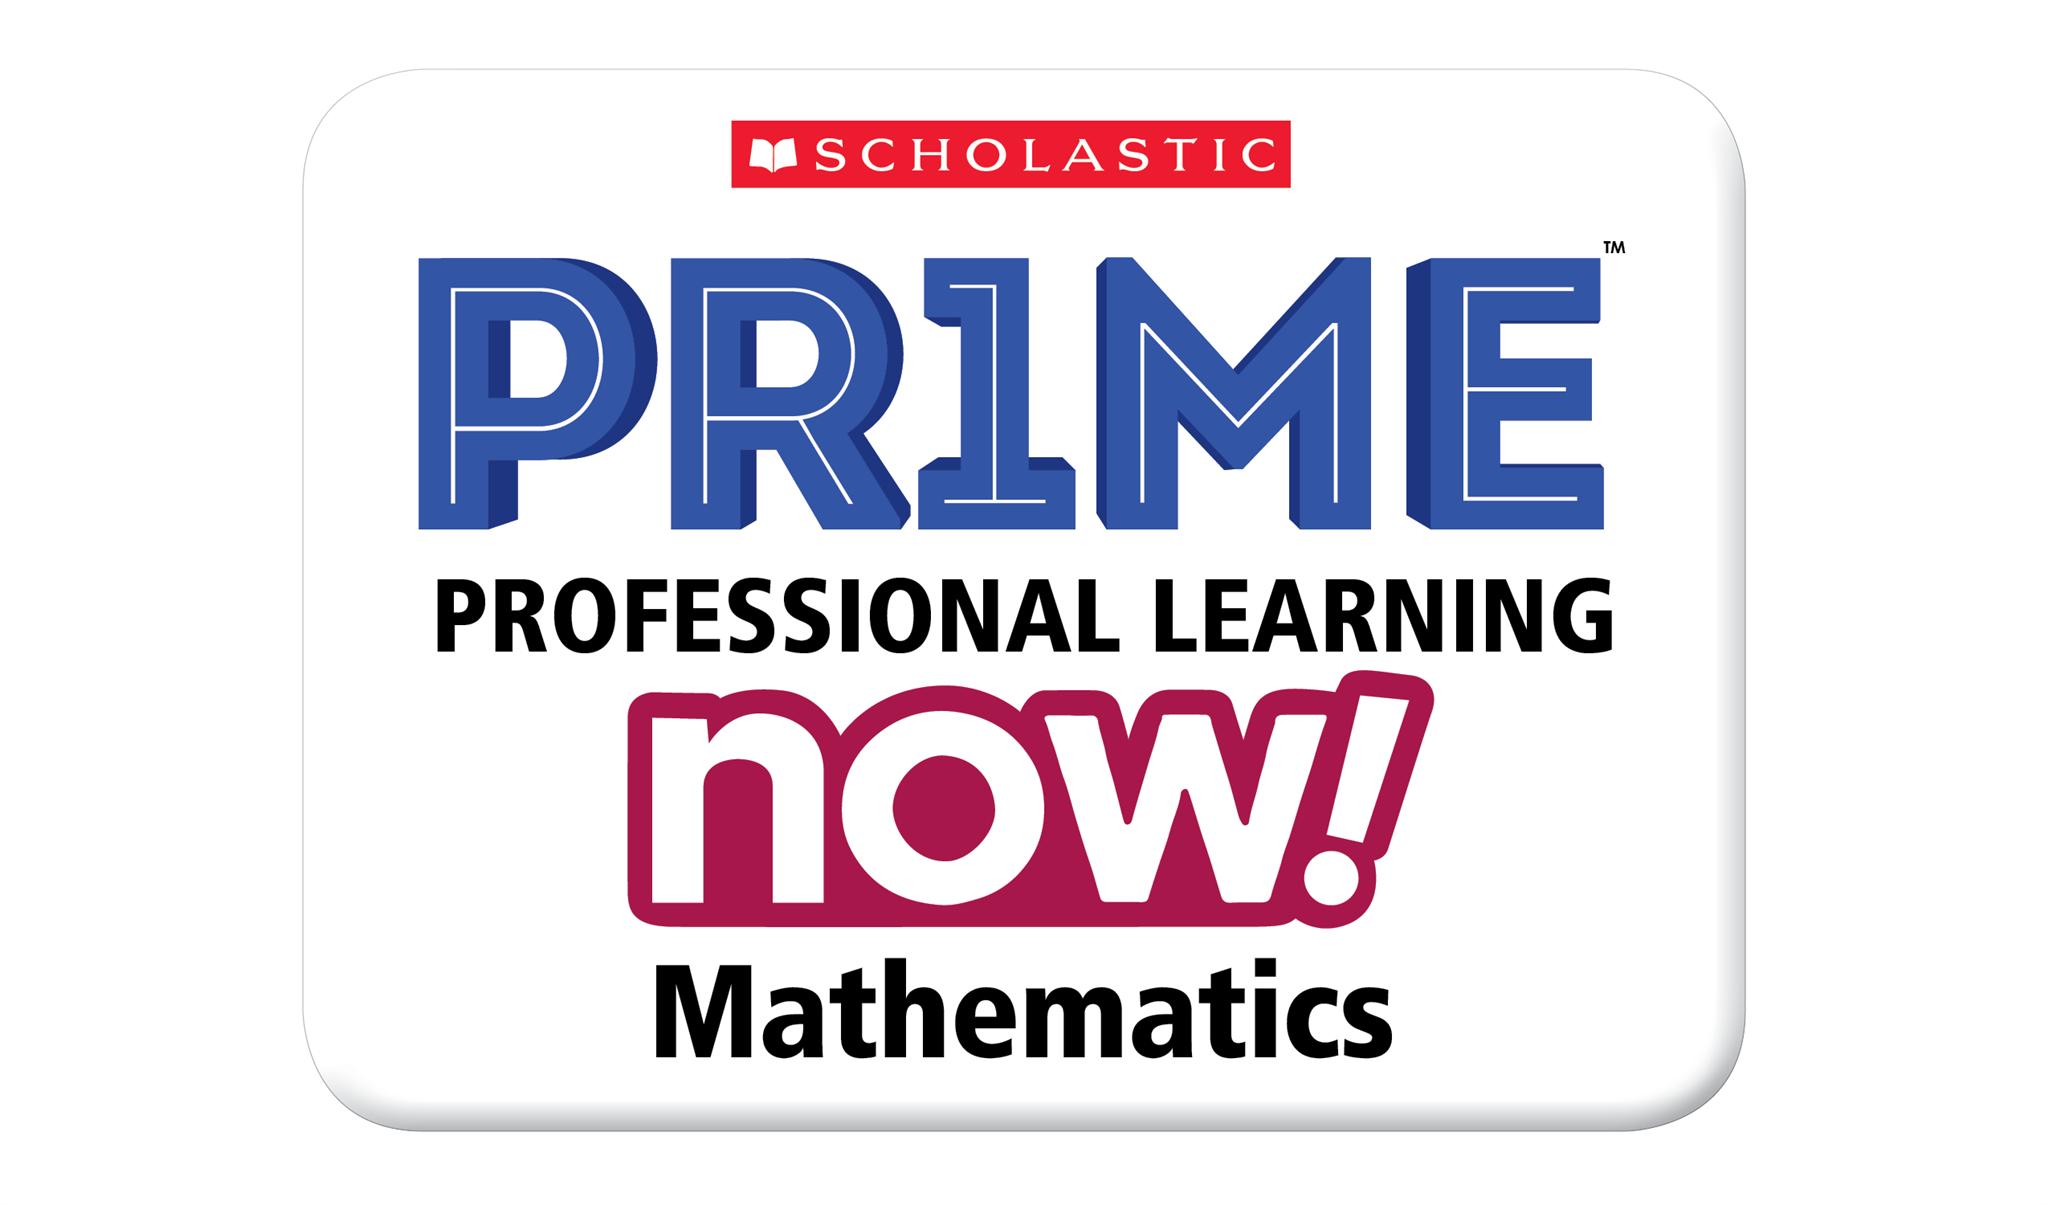 PR1ME Mathematics - Teacher Support | PR1ME Mathematics